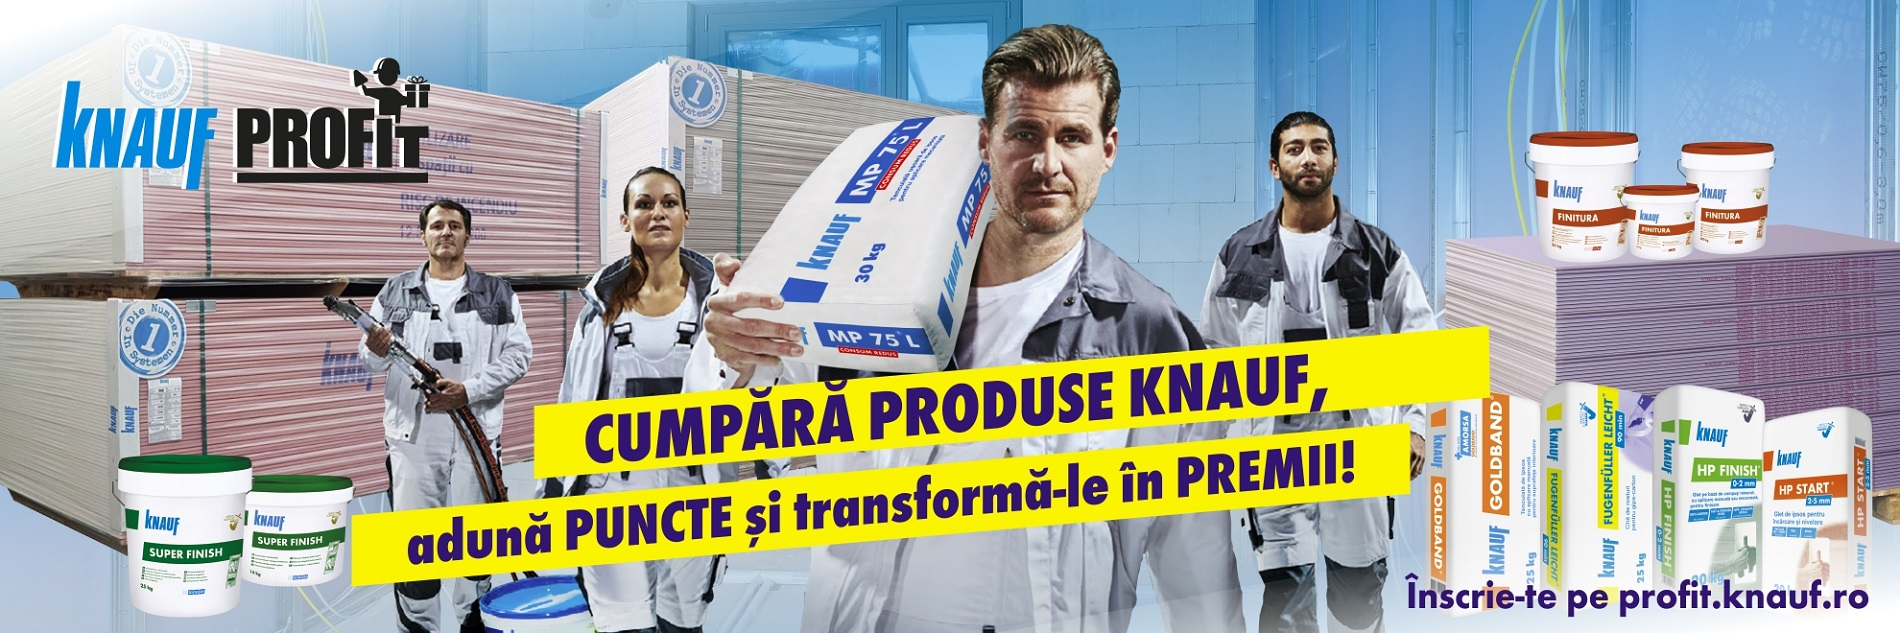 Campanie promoțională Knauf